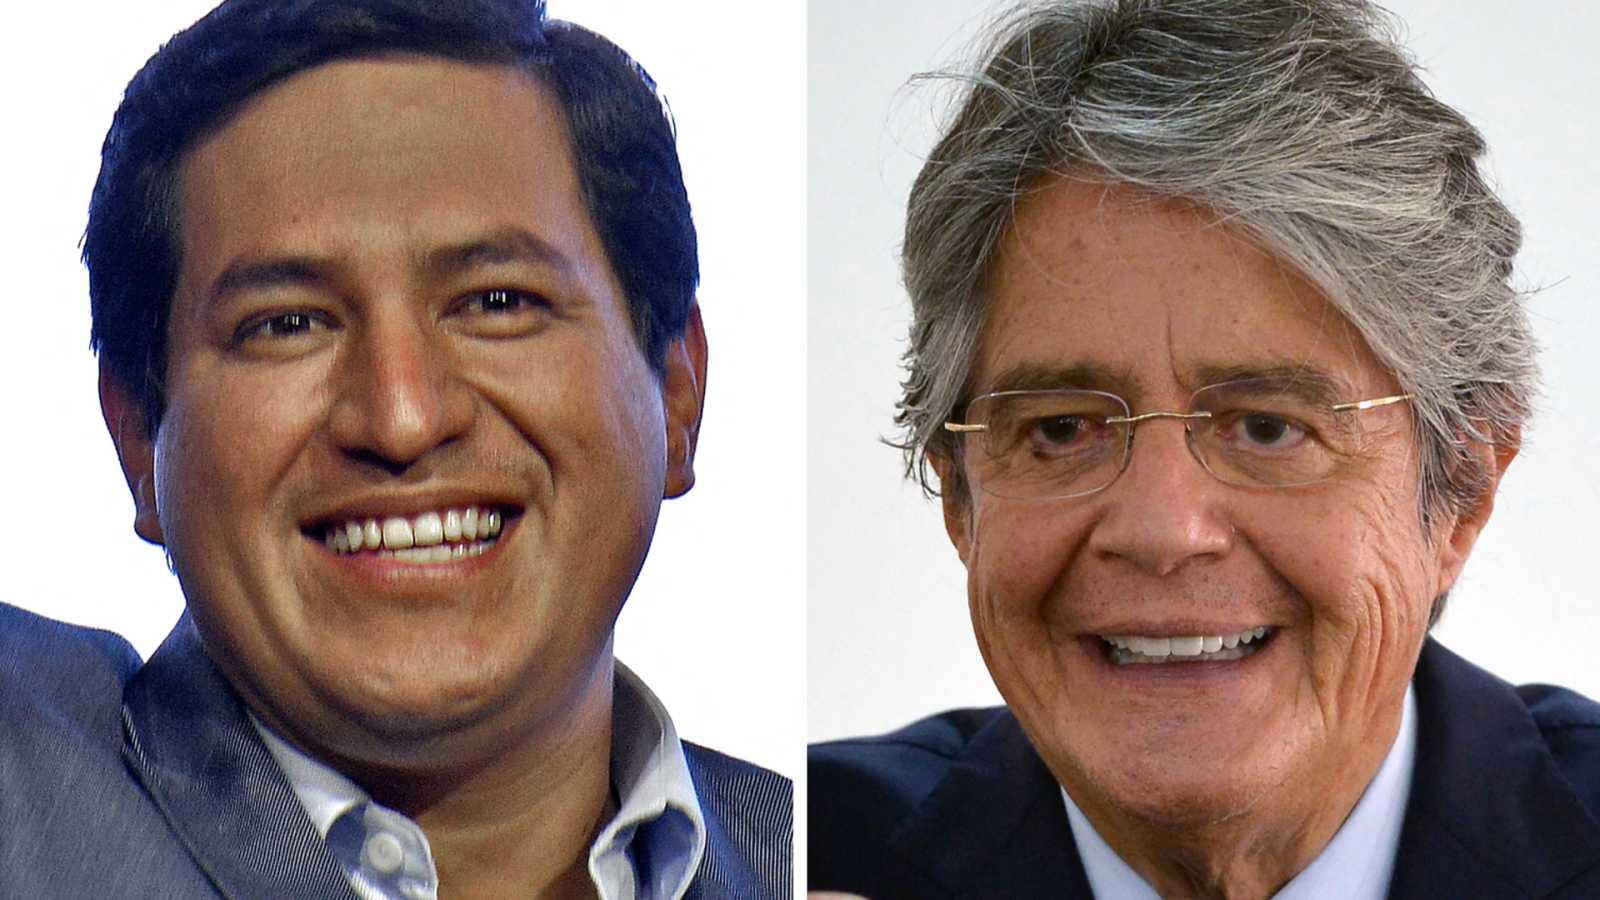 Cinco continentes - Ecuador elige entre Arauz o Lasso - Escuchar ahora